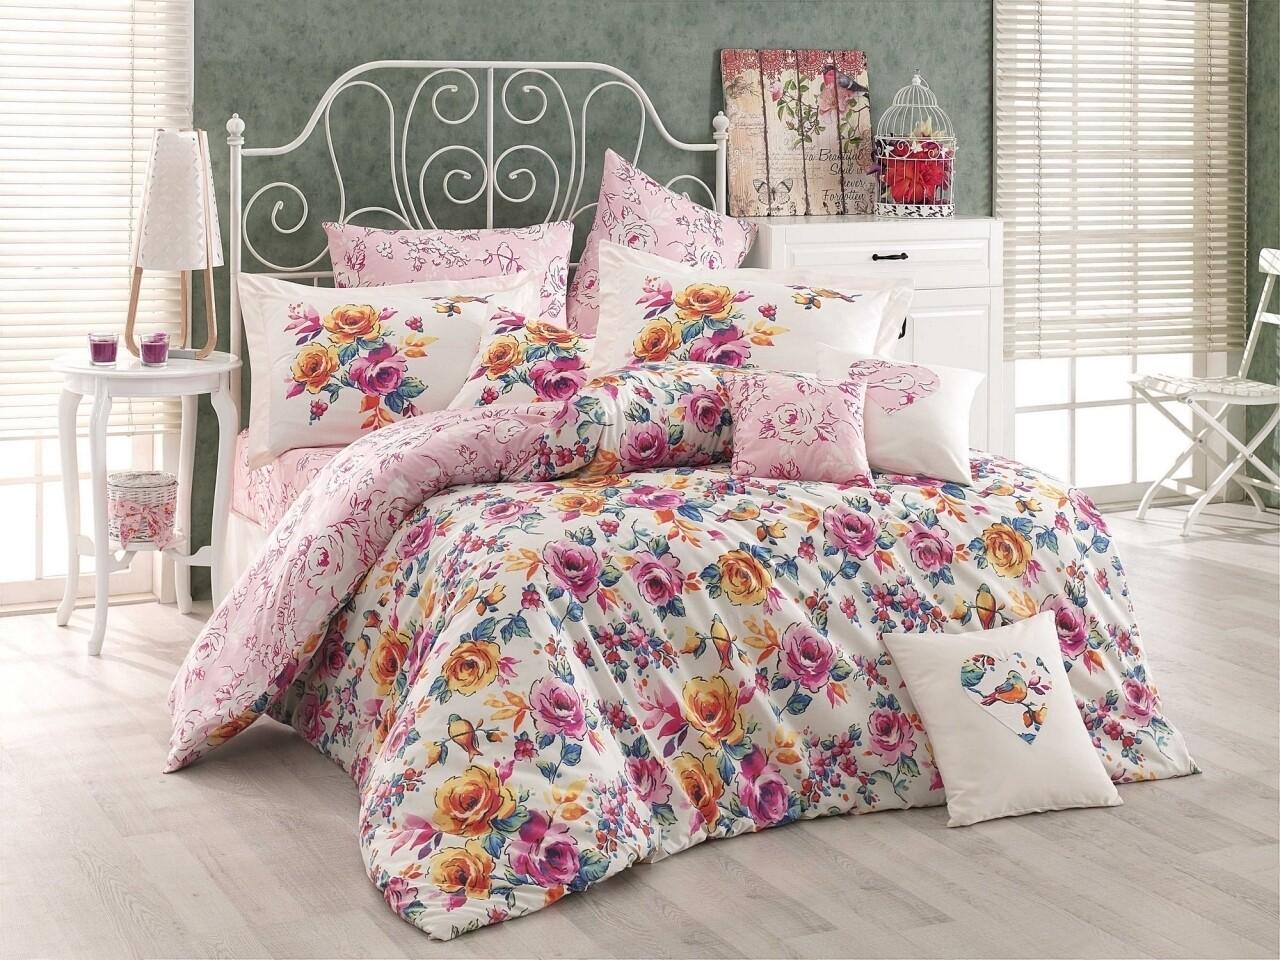 Lenjerie de pat pentru o persoana, 3 piese, 100% bumbac poplin, Hobby, Alessia, roz